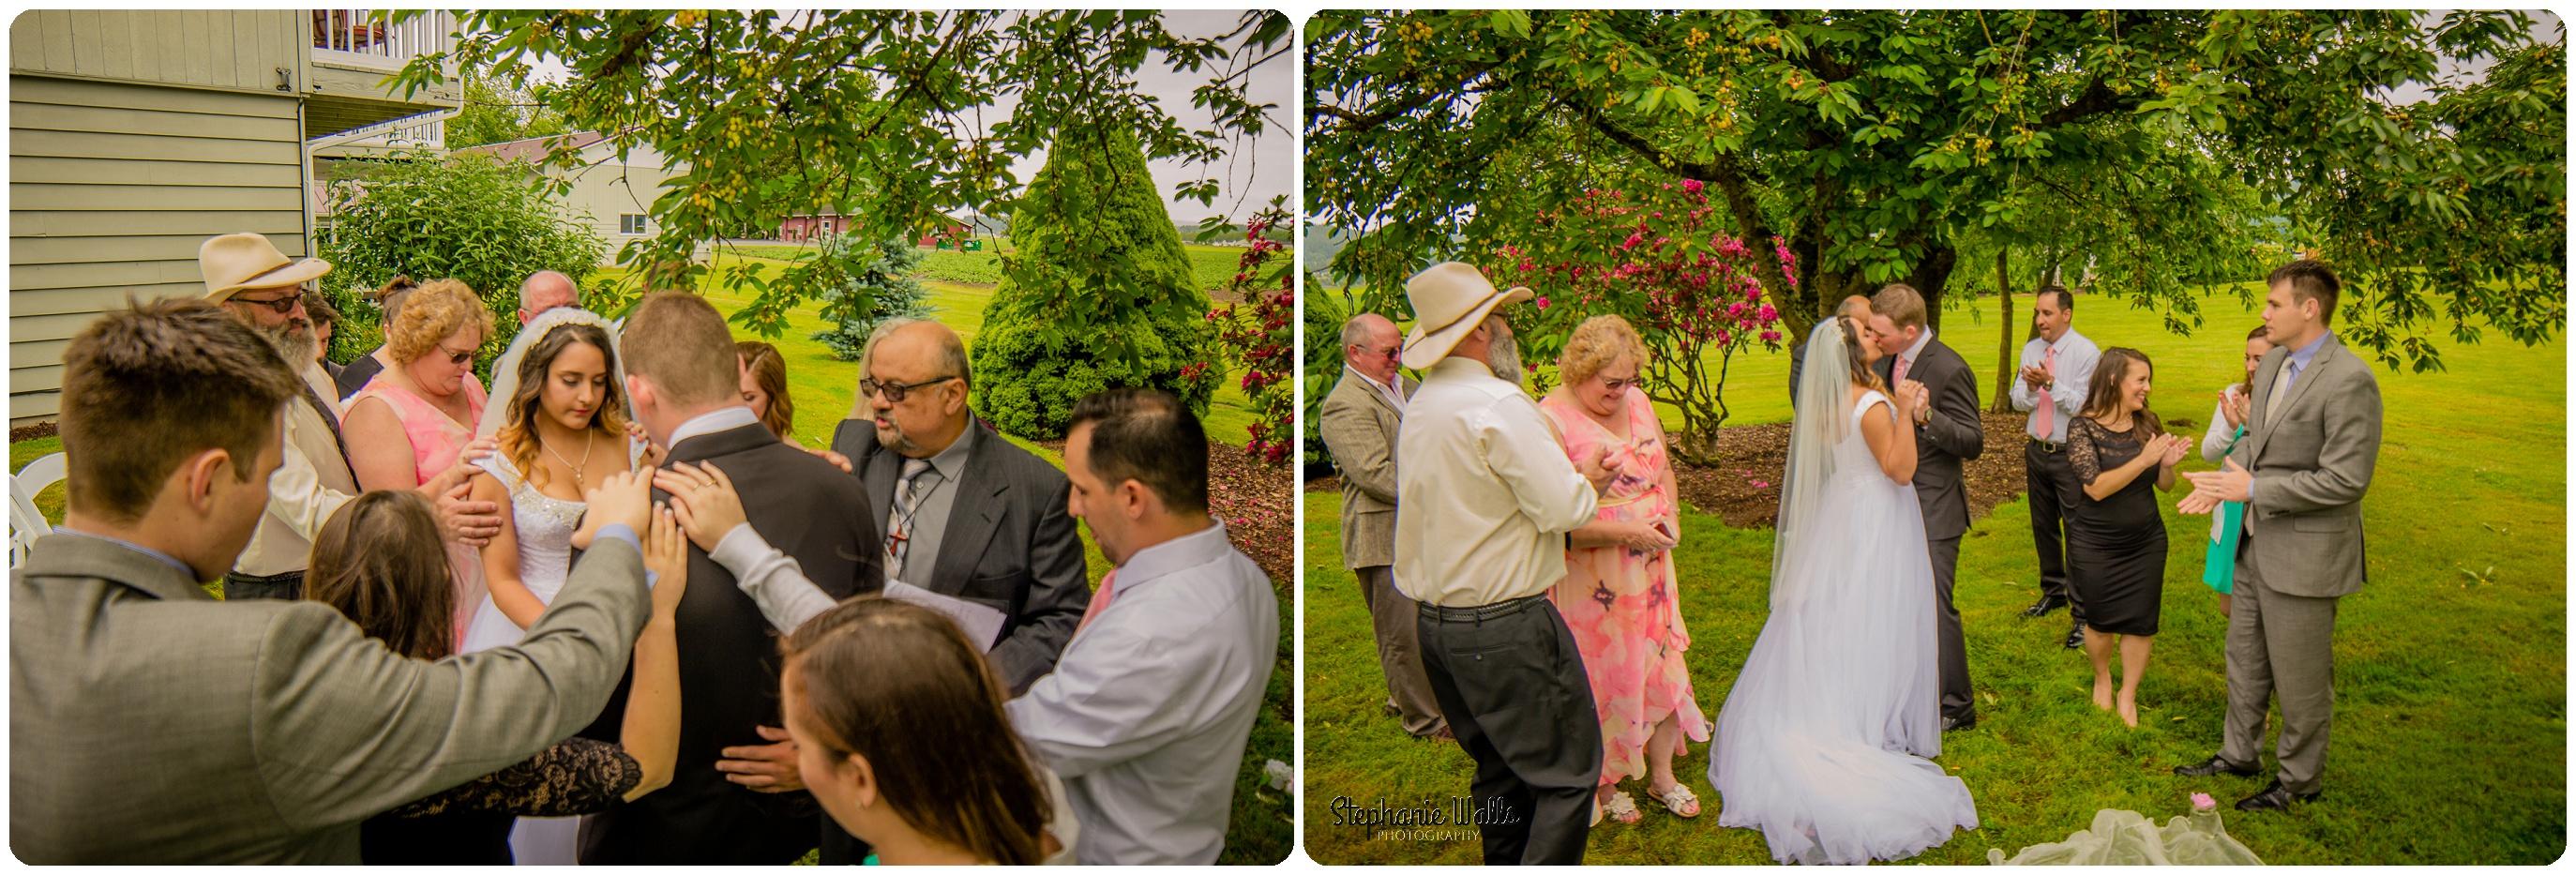 Miller Wedding149 WHERE EVER YOU GO | MAPLEHURST FARMS GUESTHOUSE | STEPHANIE WALLS PHOTOGRAPHY